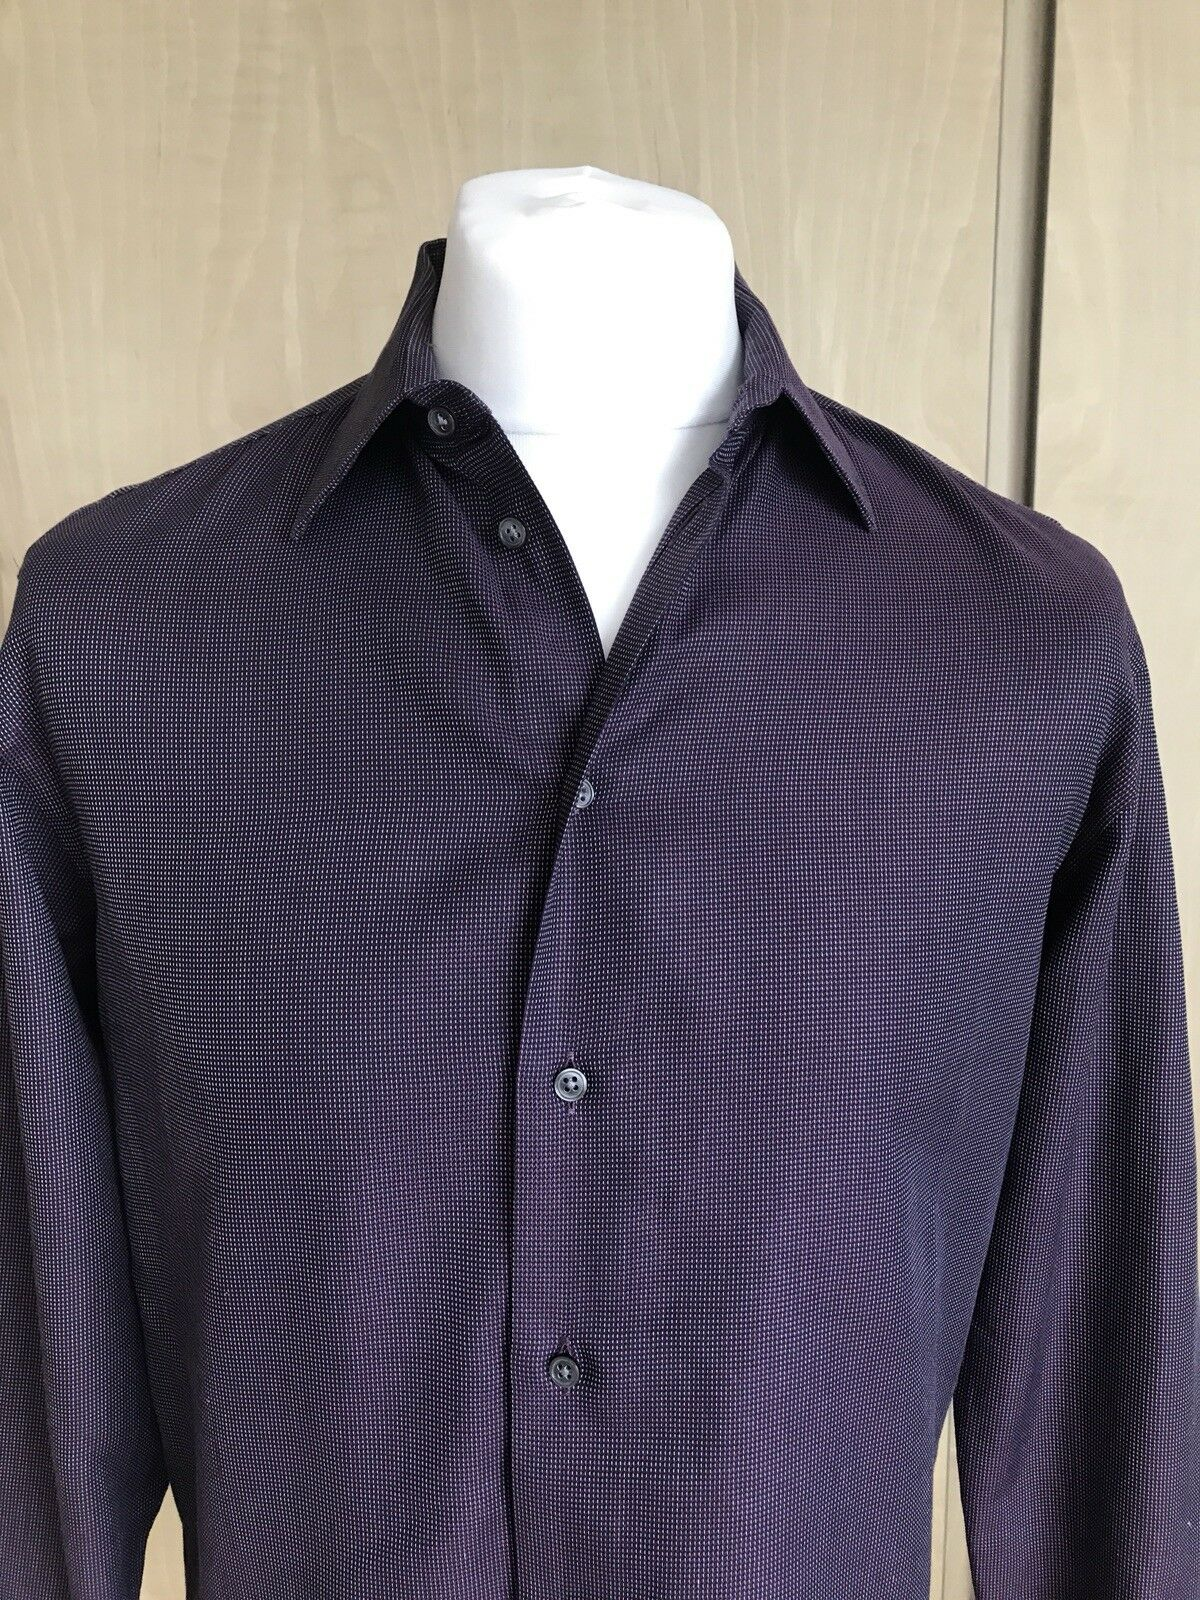 Armani Collezioni männer Texturot Formal hemd  Dark lila  Größe 39 IT= 15.5 USA.